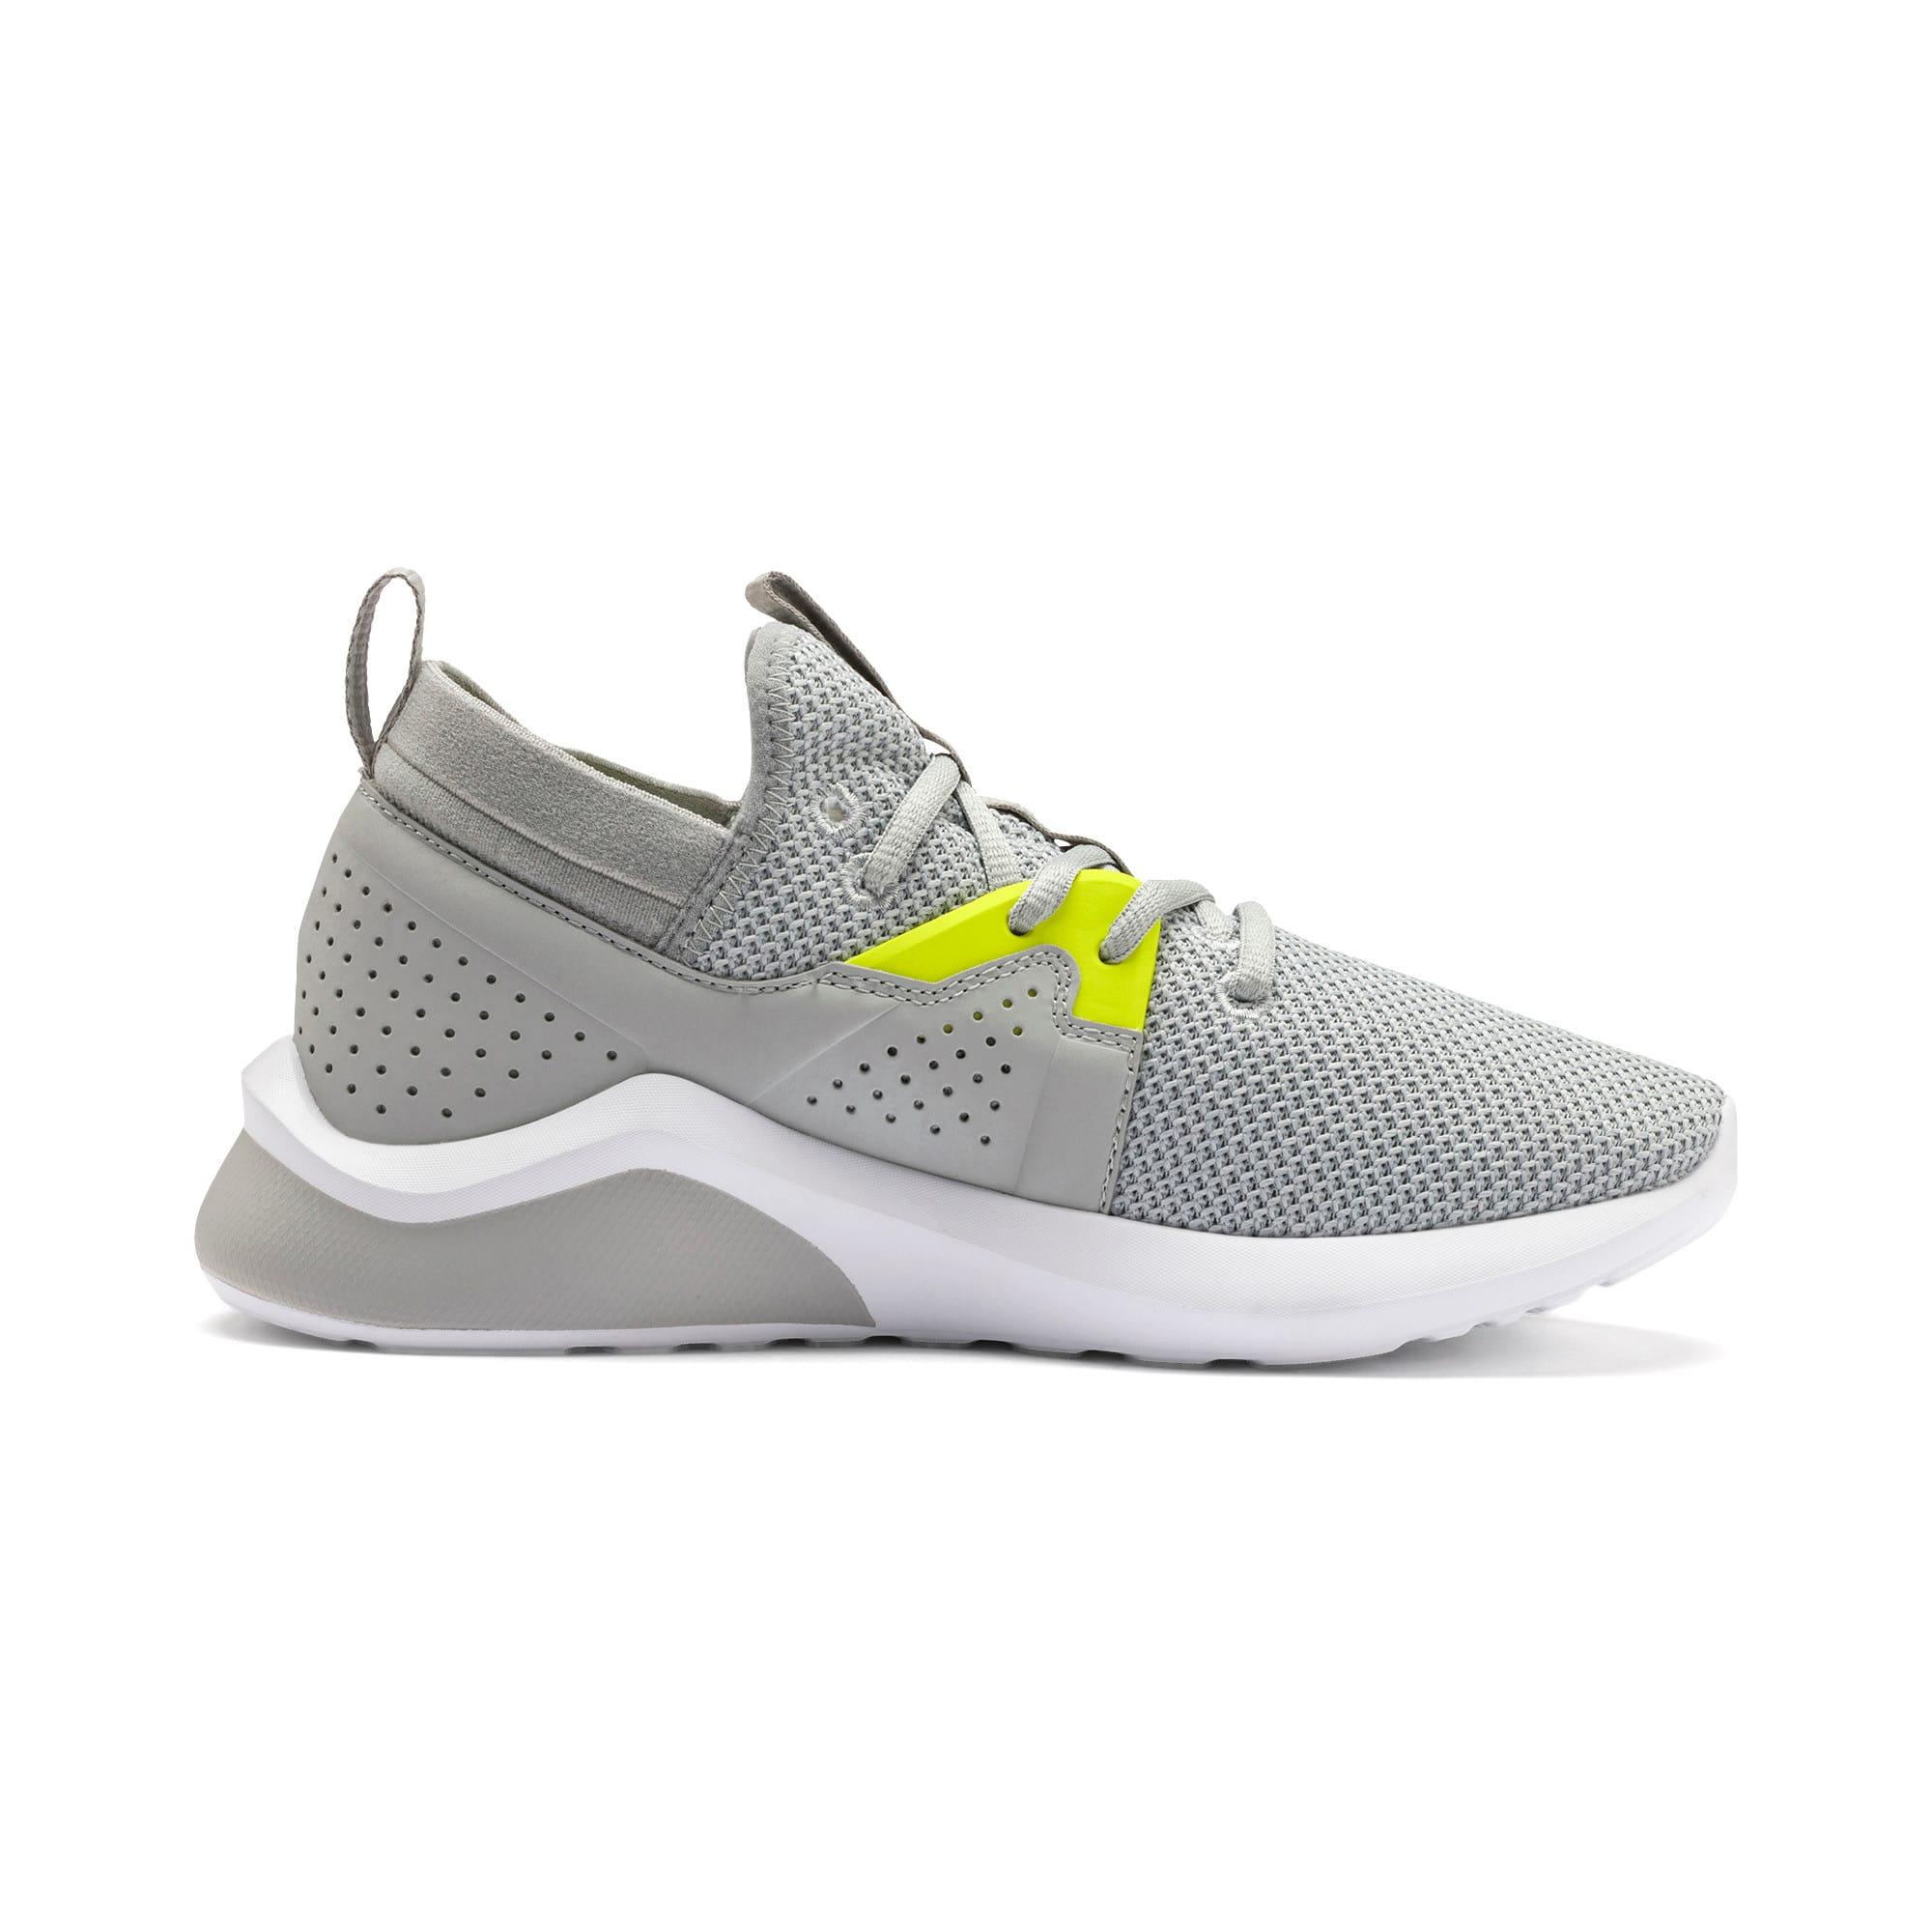 Thumbnail 5 of Emergence Sneakers JR, High Rise-Nrgy Yellow, medium